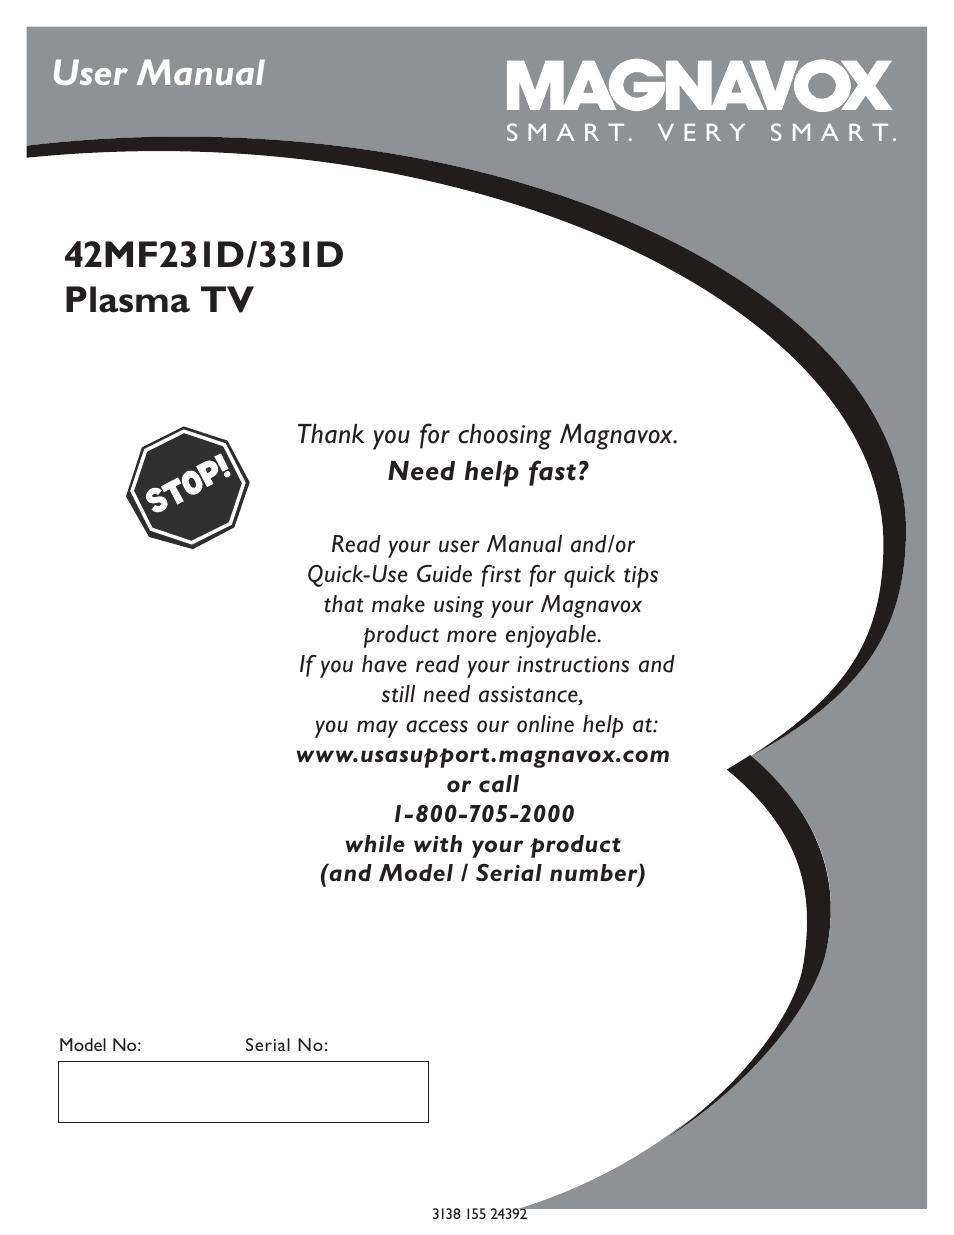 philips magnavox 42mf231d 331d user manual 39 pages rh manualsdir com TV Blu-ray Combo 1080P Blue Ray Combo TV